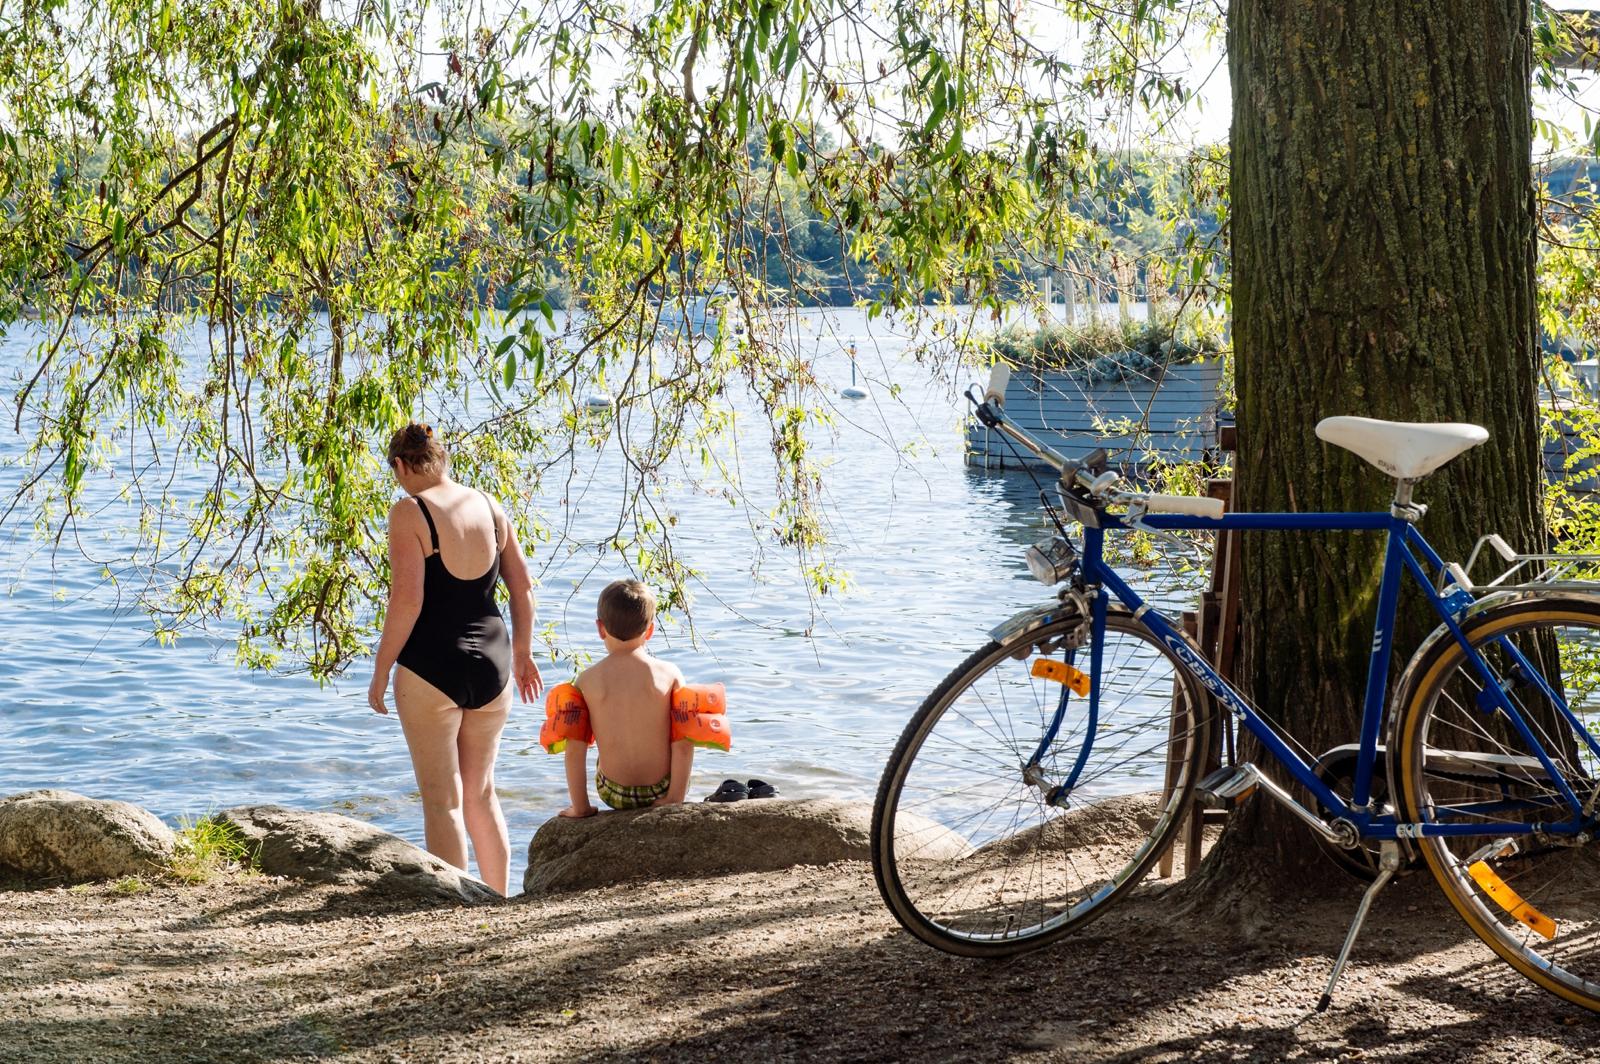 Stockholm summer fun